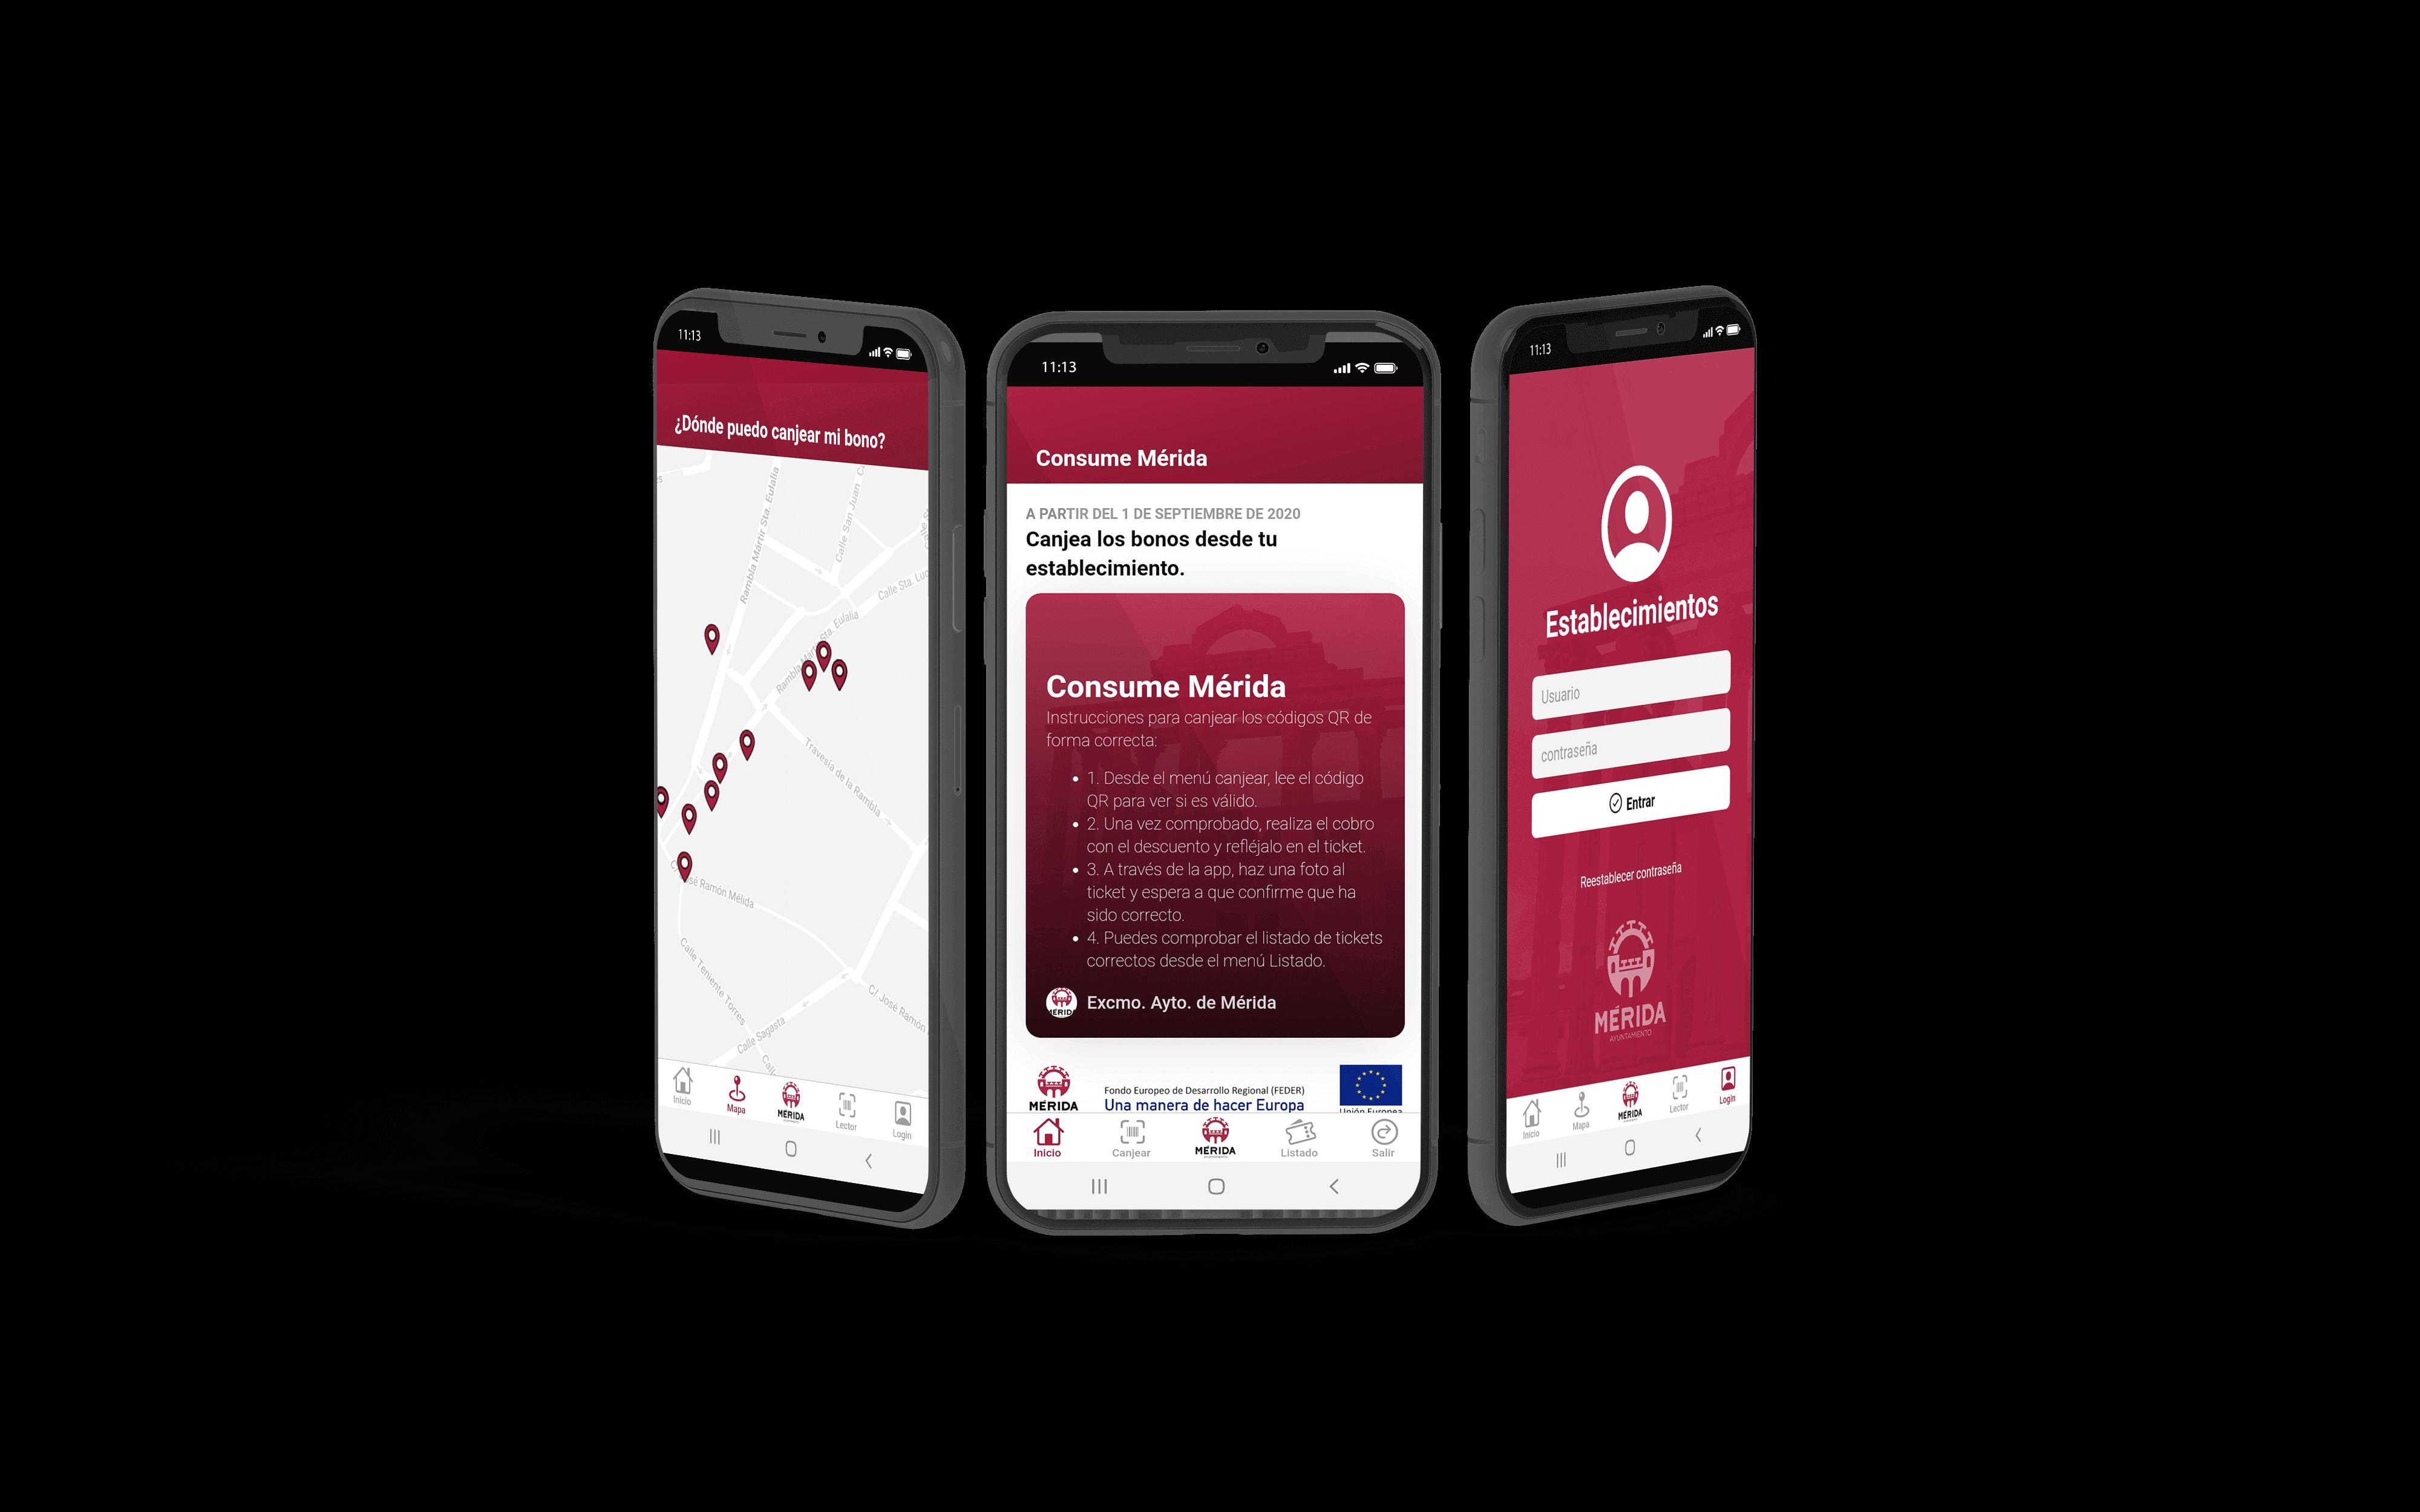 Capturas de pantalla de la funcionalidad de la App de Consume Mérida